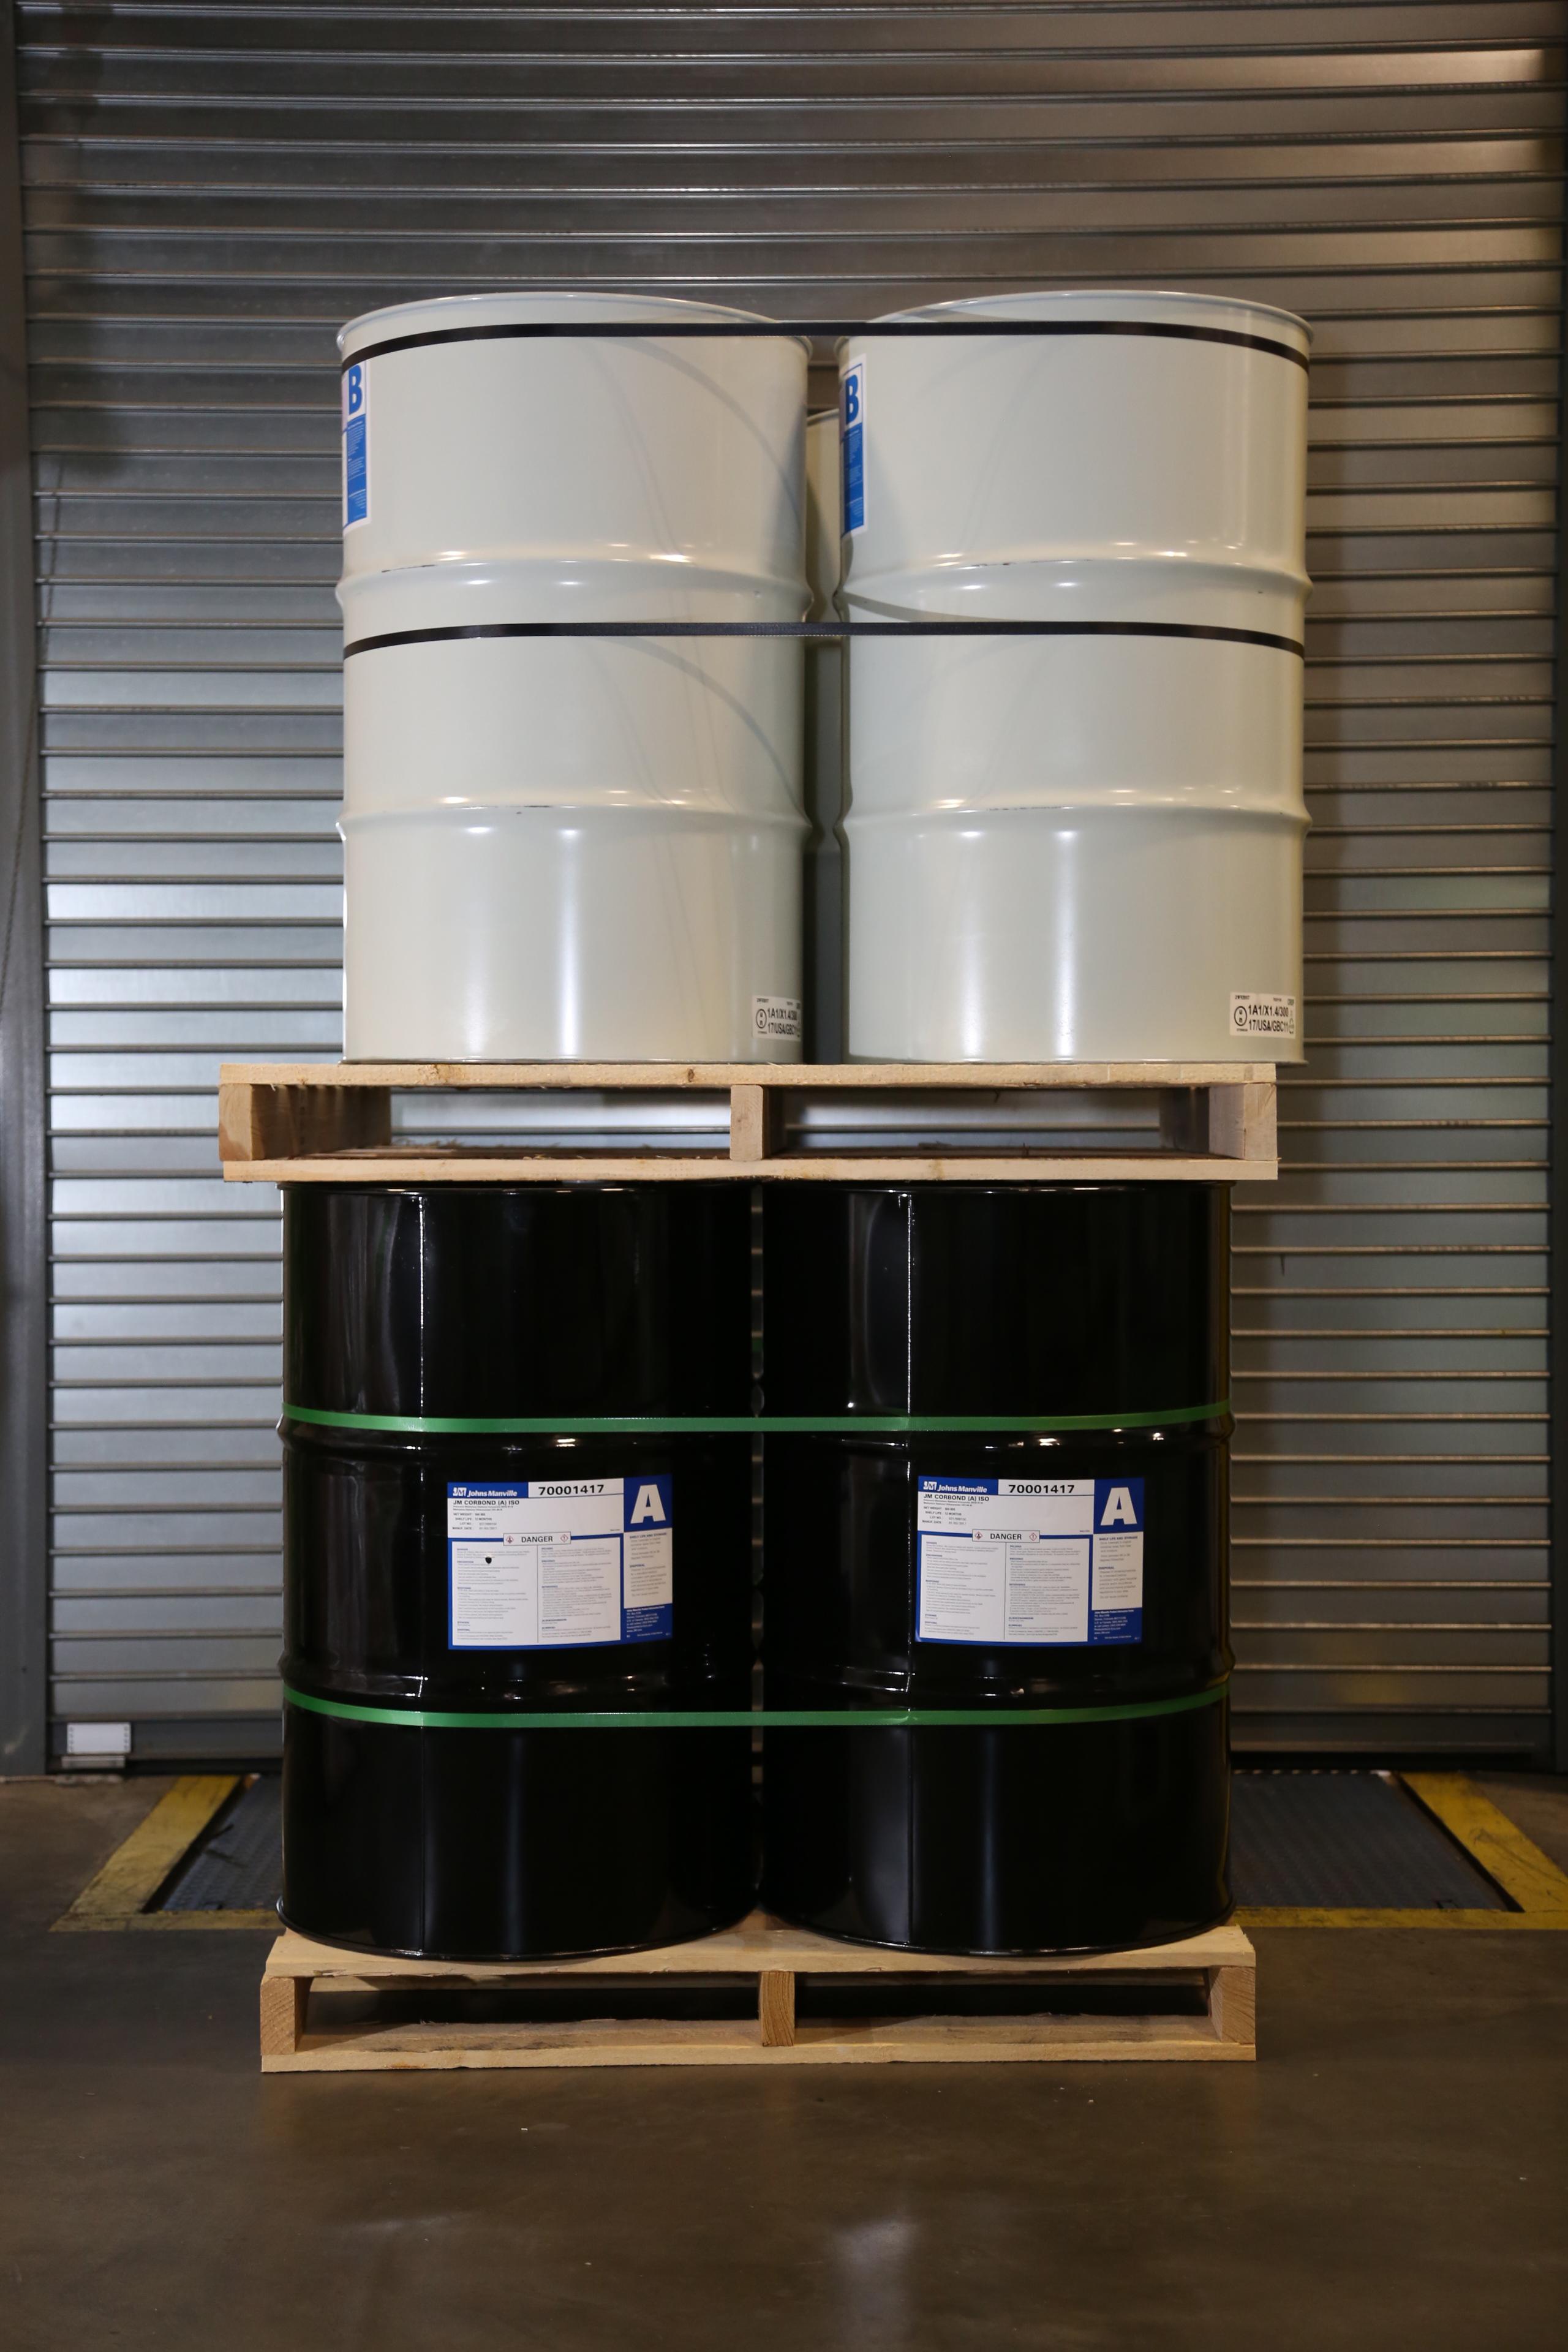 Johns Manville Corbond Spray Foam 55 Gallon Drums